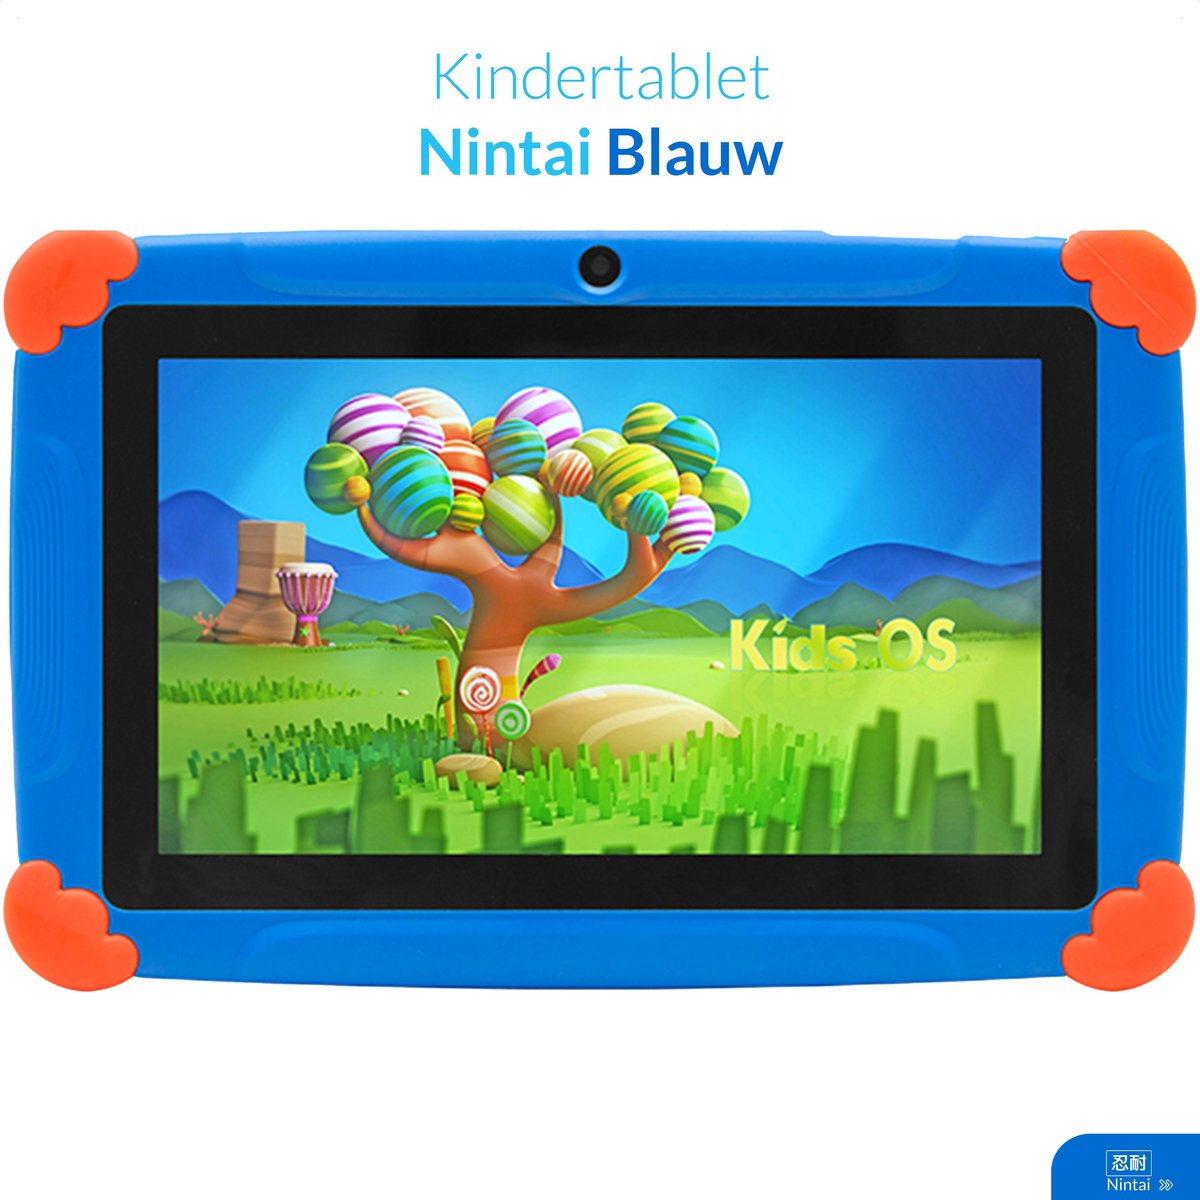 Kindertablet vanaf 4 jaar - 7inch - Kinder tablet - Blauw